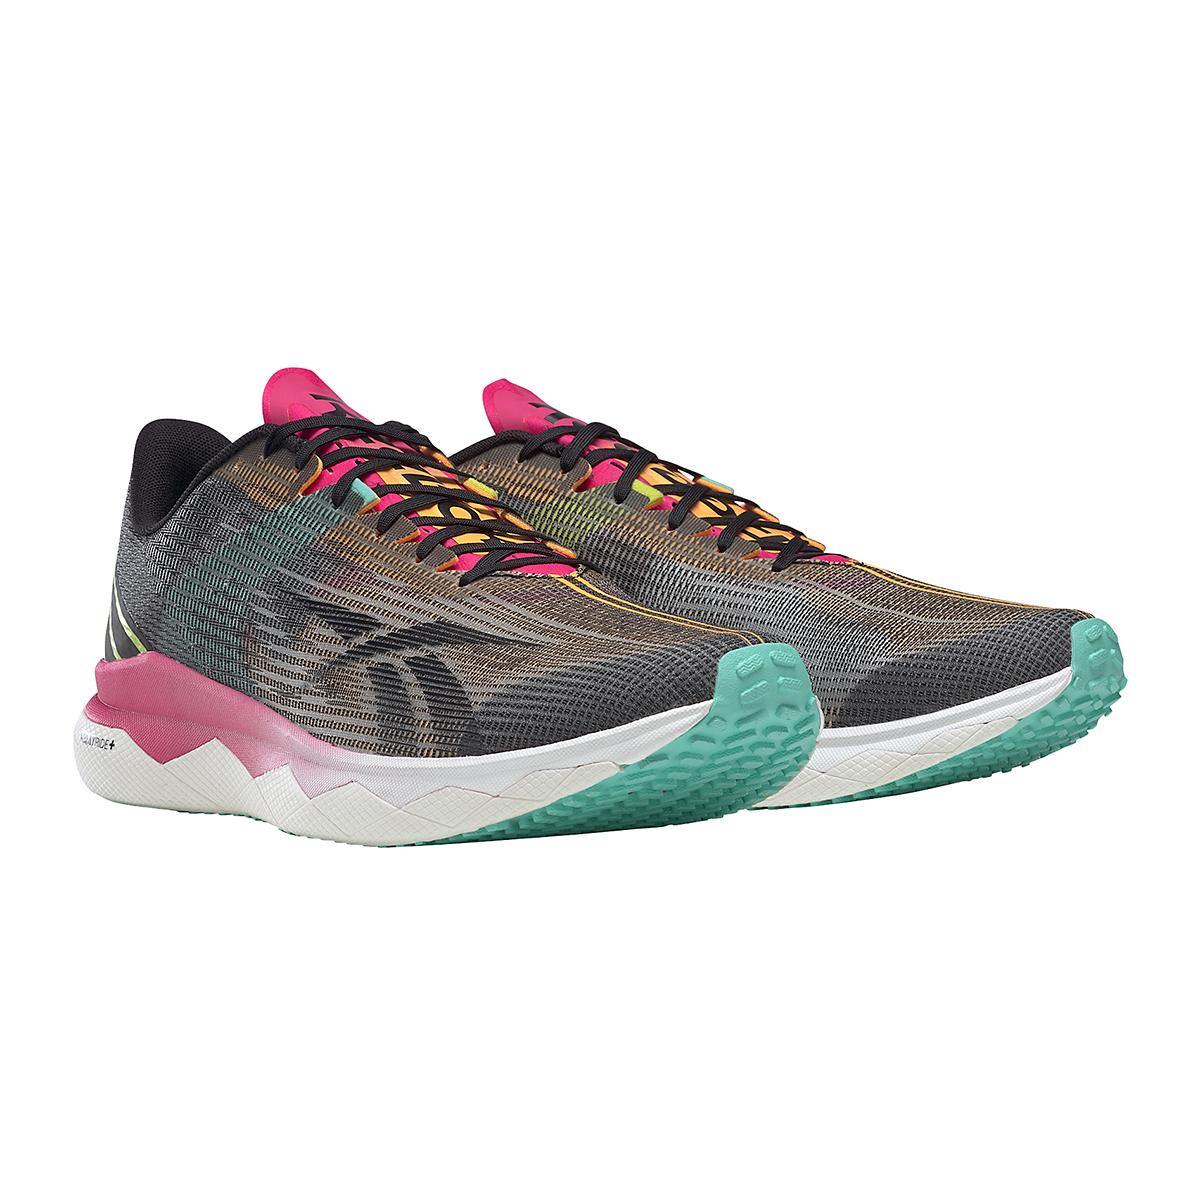 Men's Reebok Floatride Run Fast 3.0 Running Shoe - Color: Black/Purple Pink - Size: 7 - Width: Regular, Black/Purple Pink, large, image 5